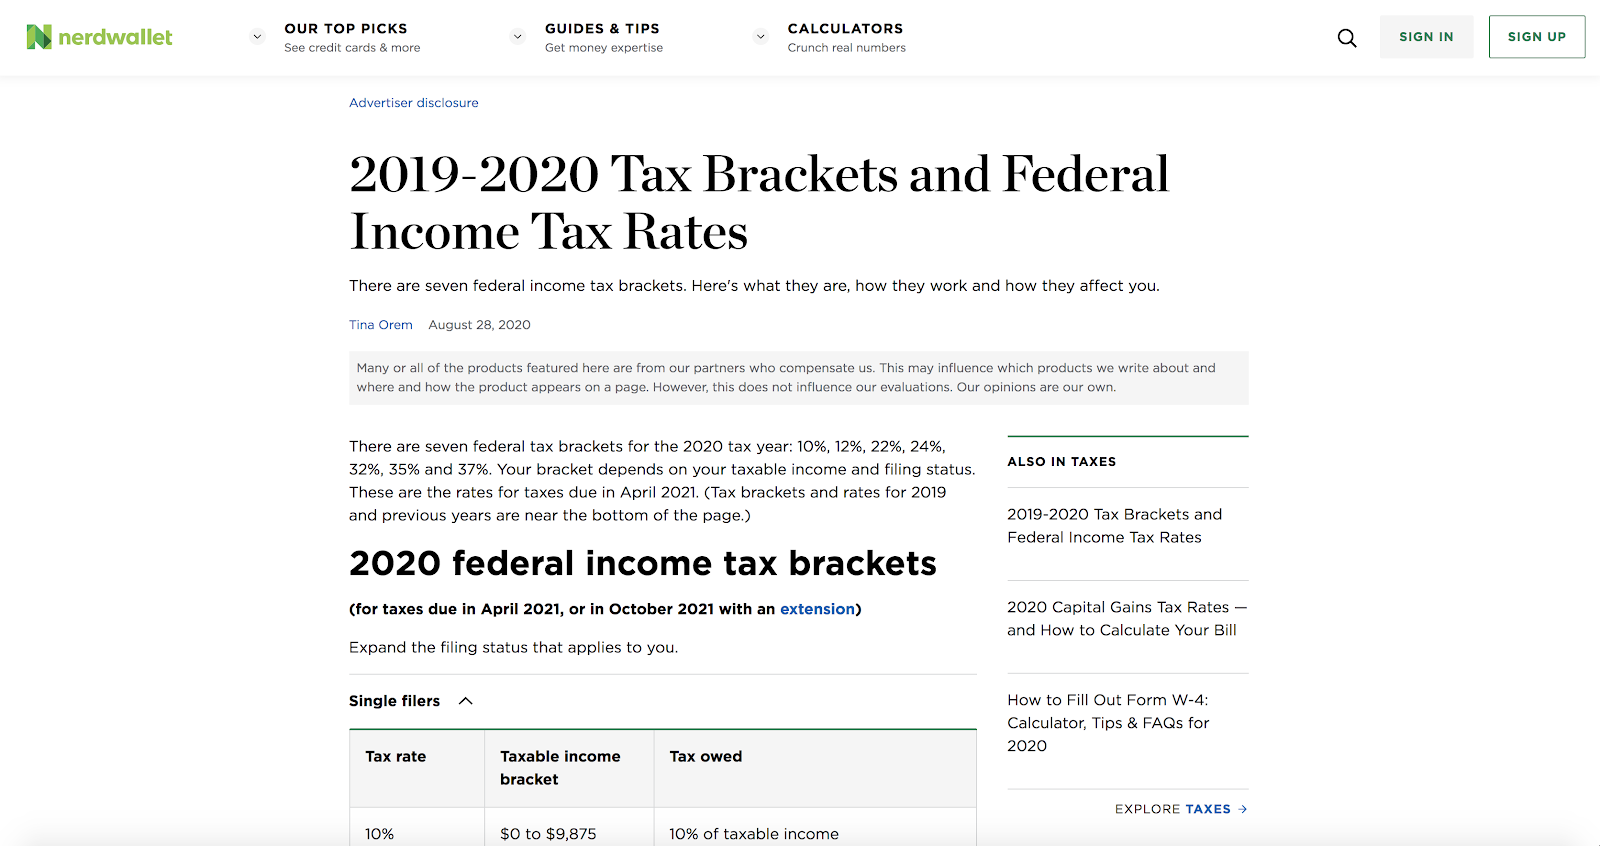 nerdwallet income tax